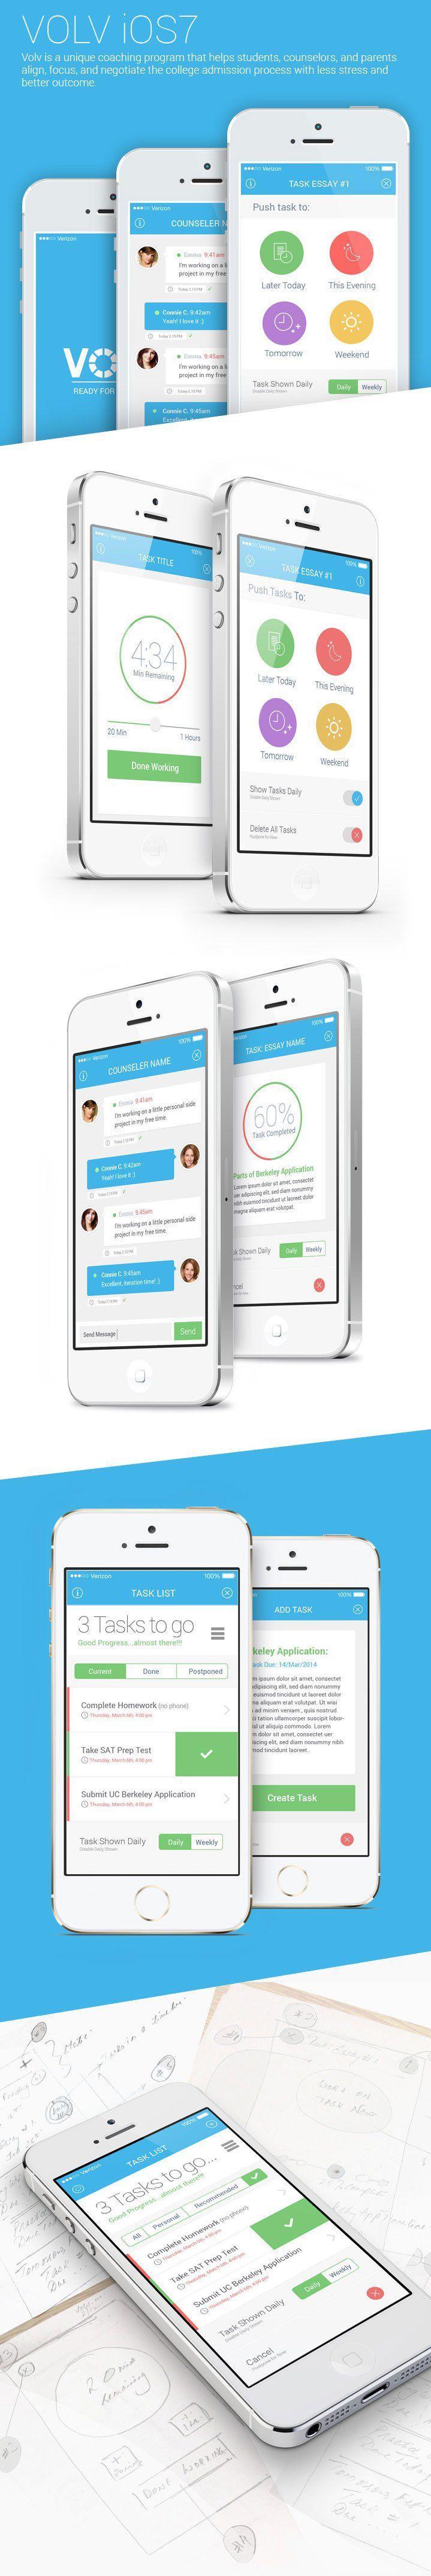 Volv: iOS7 Mobile App